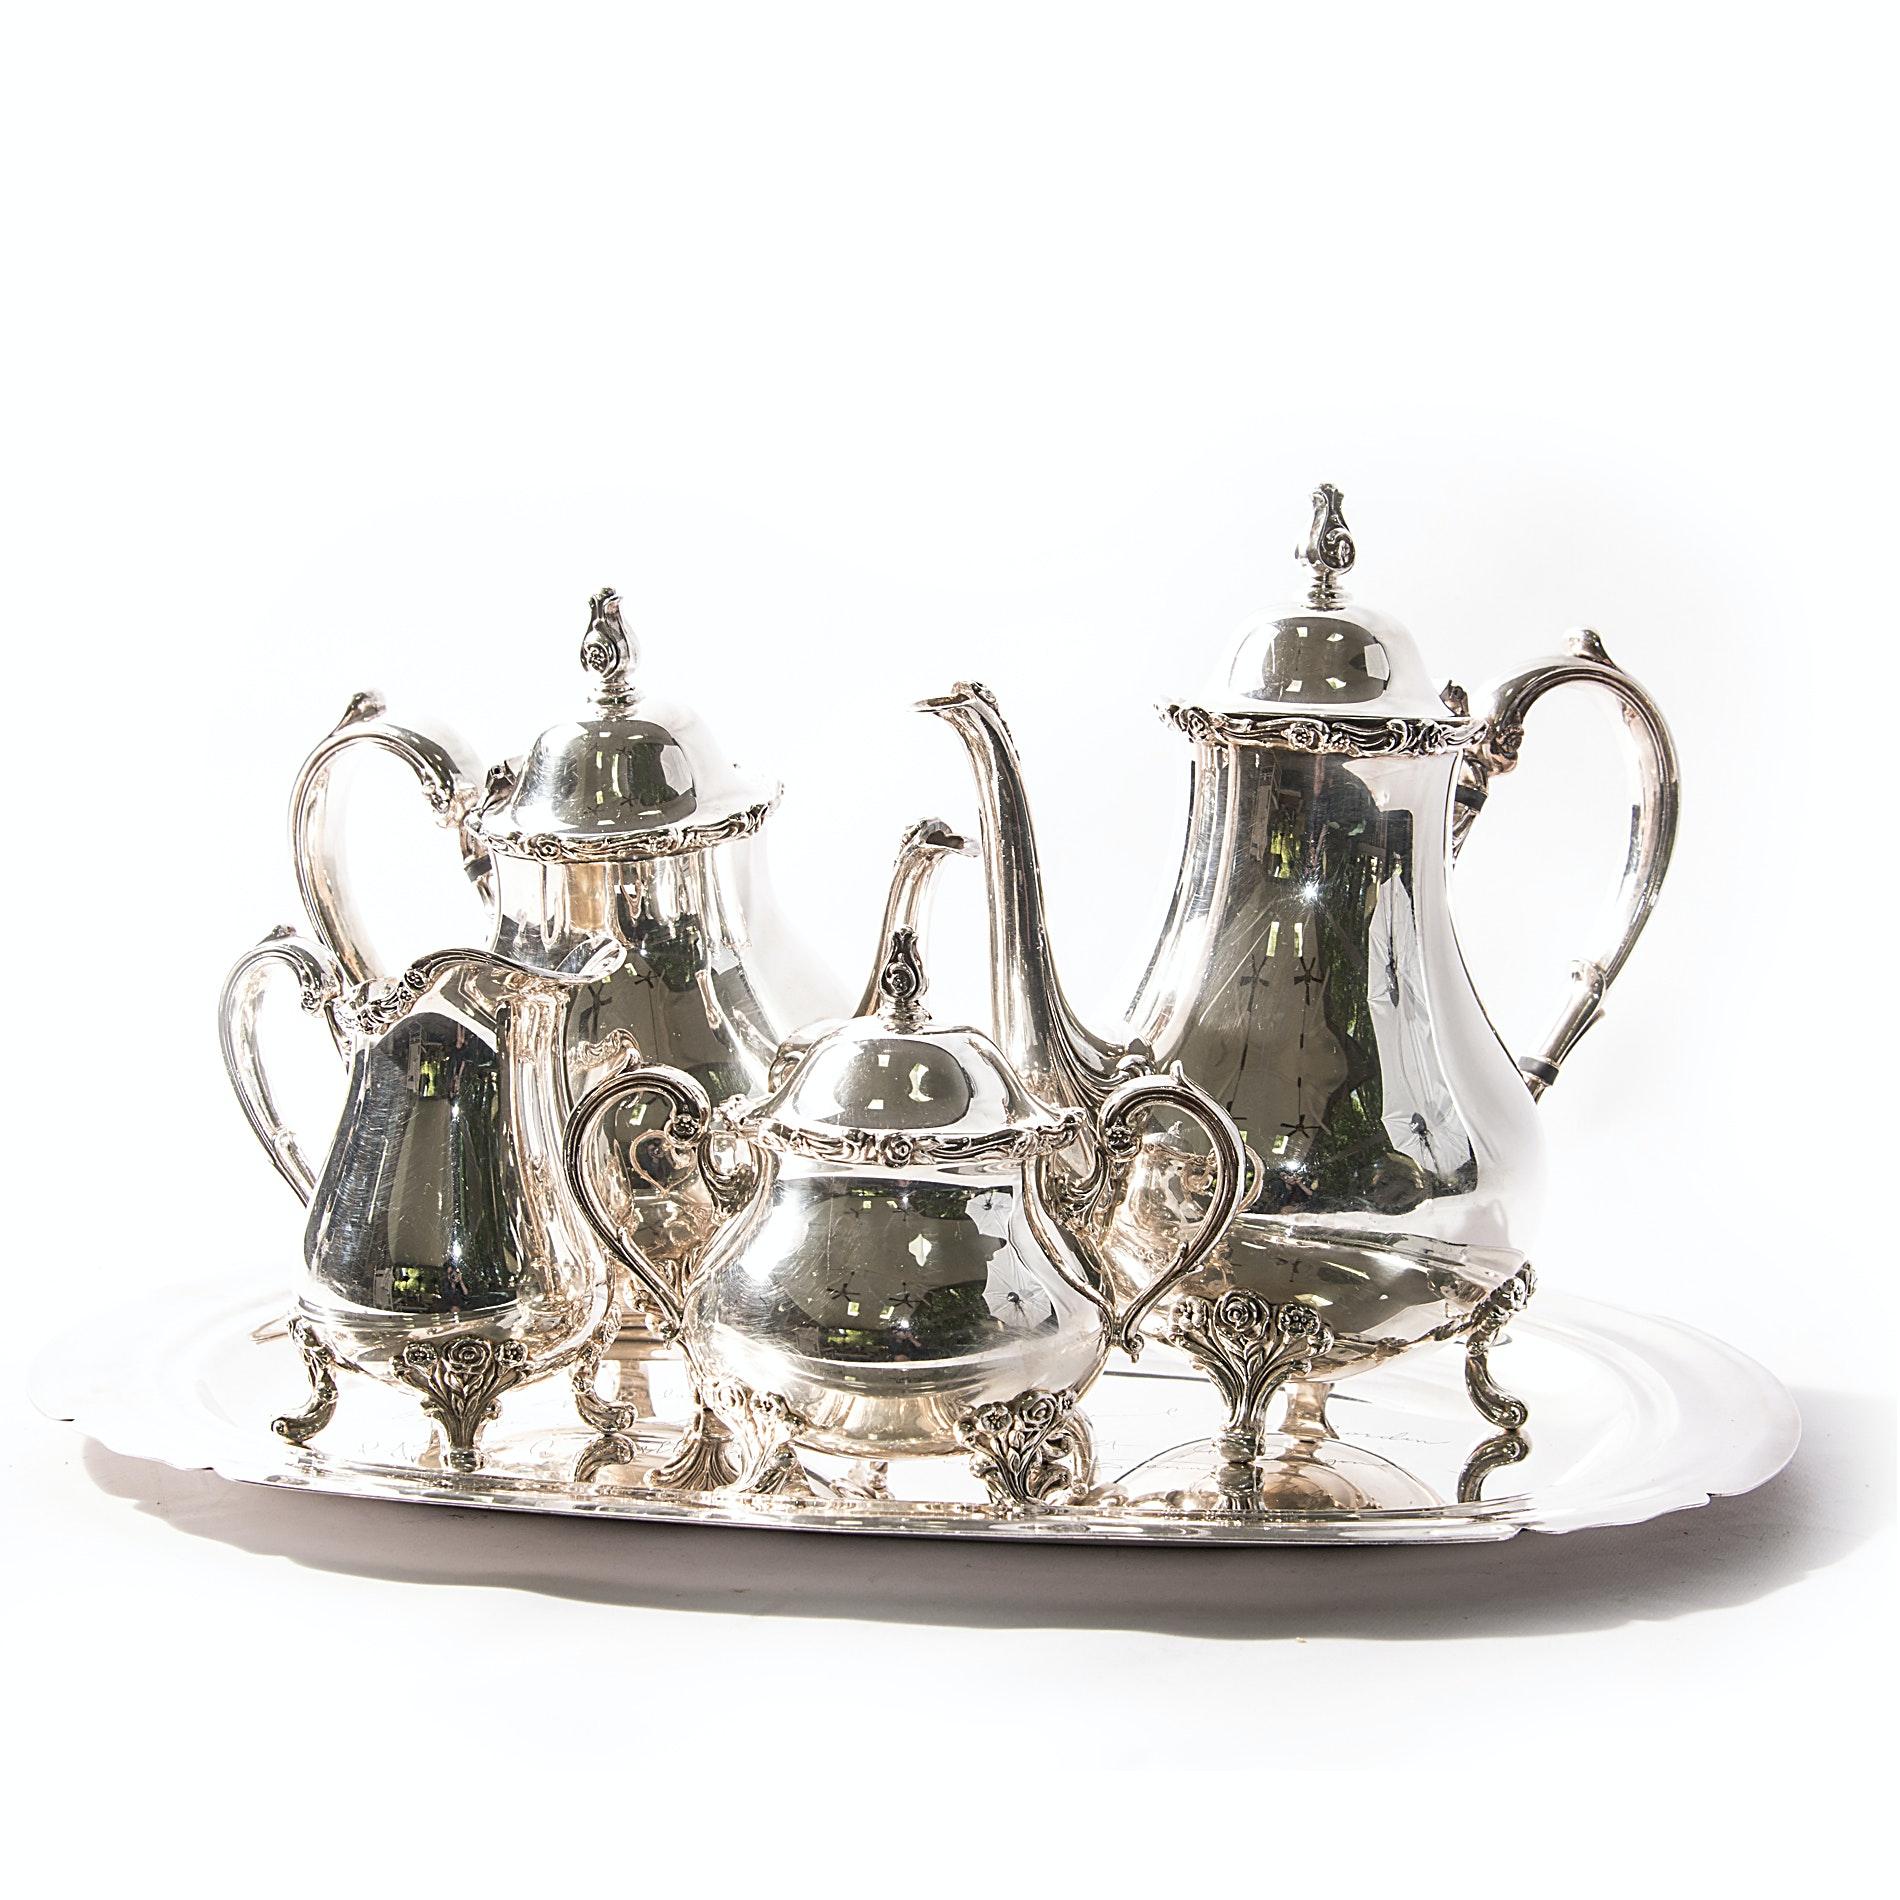 "Wilcox ""American Rose"" Silver Plate Tea Service and More"